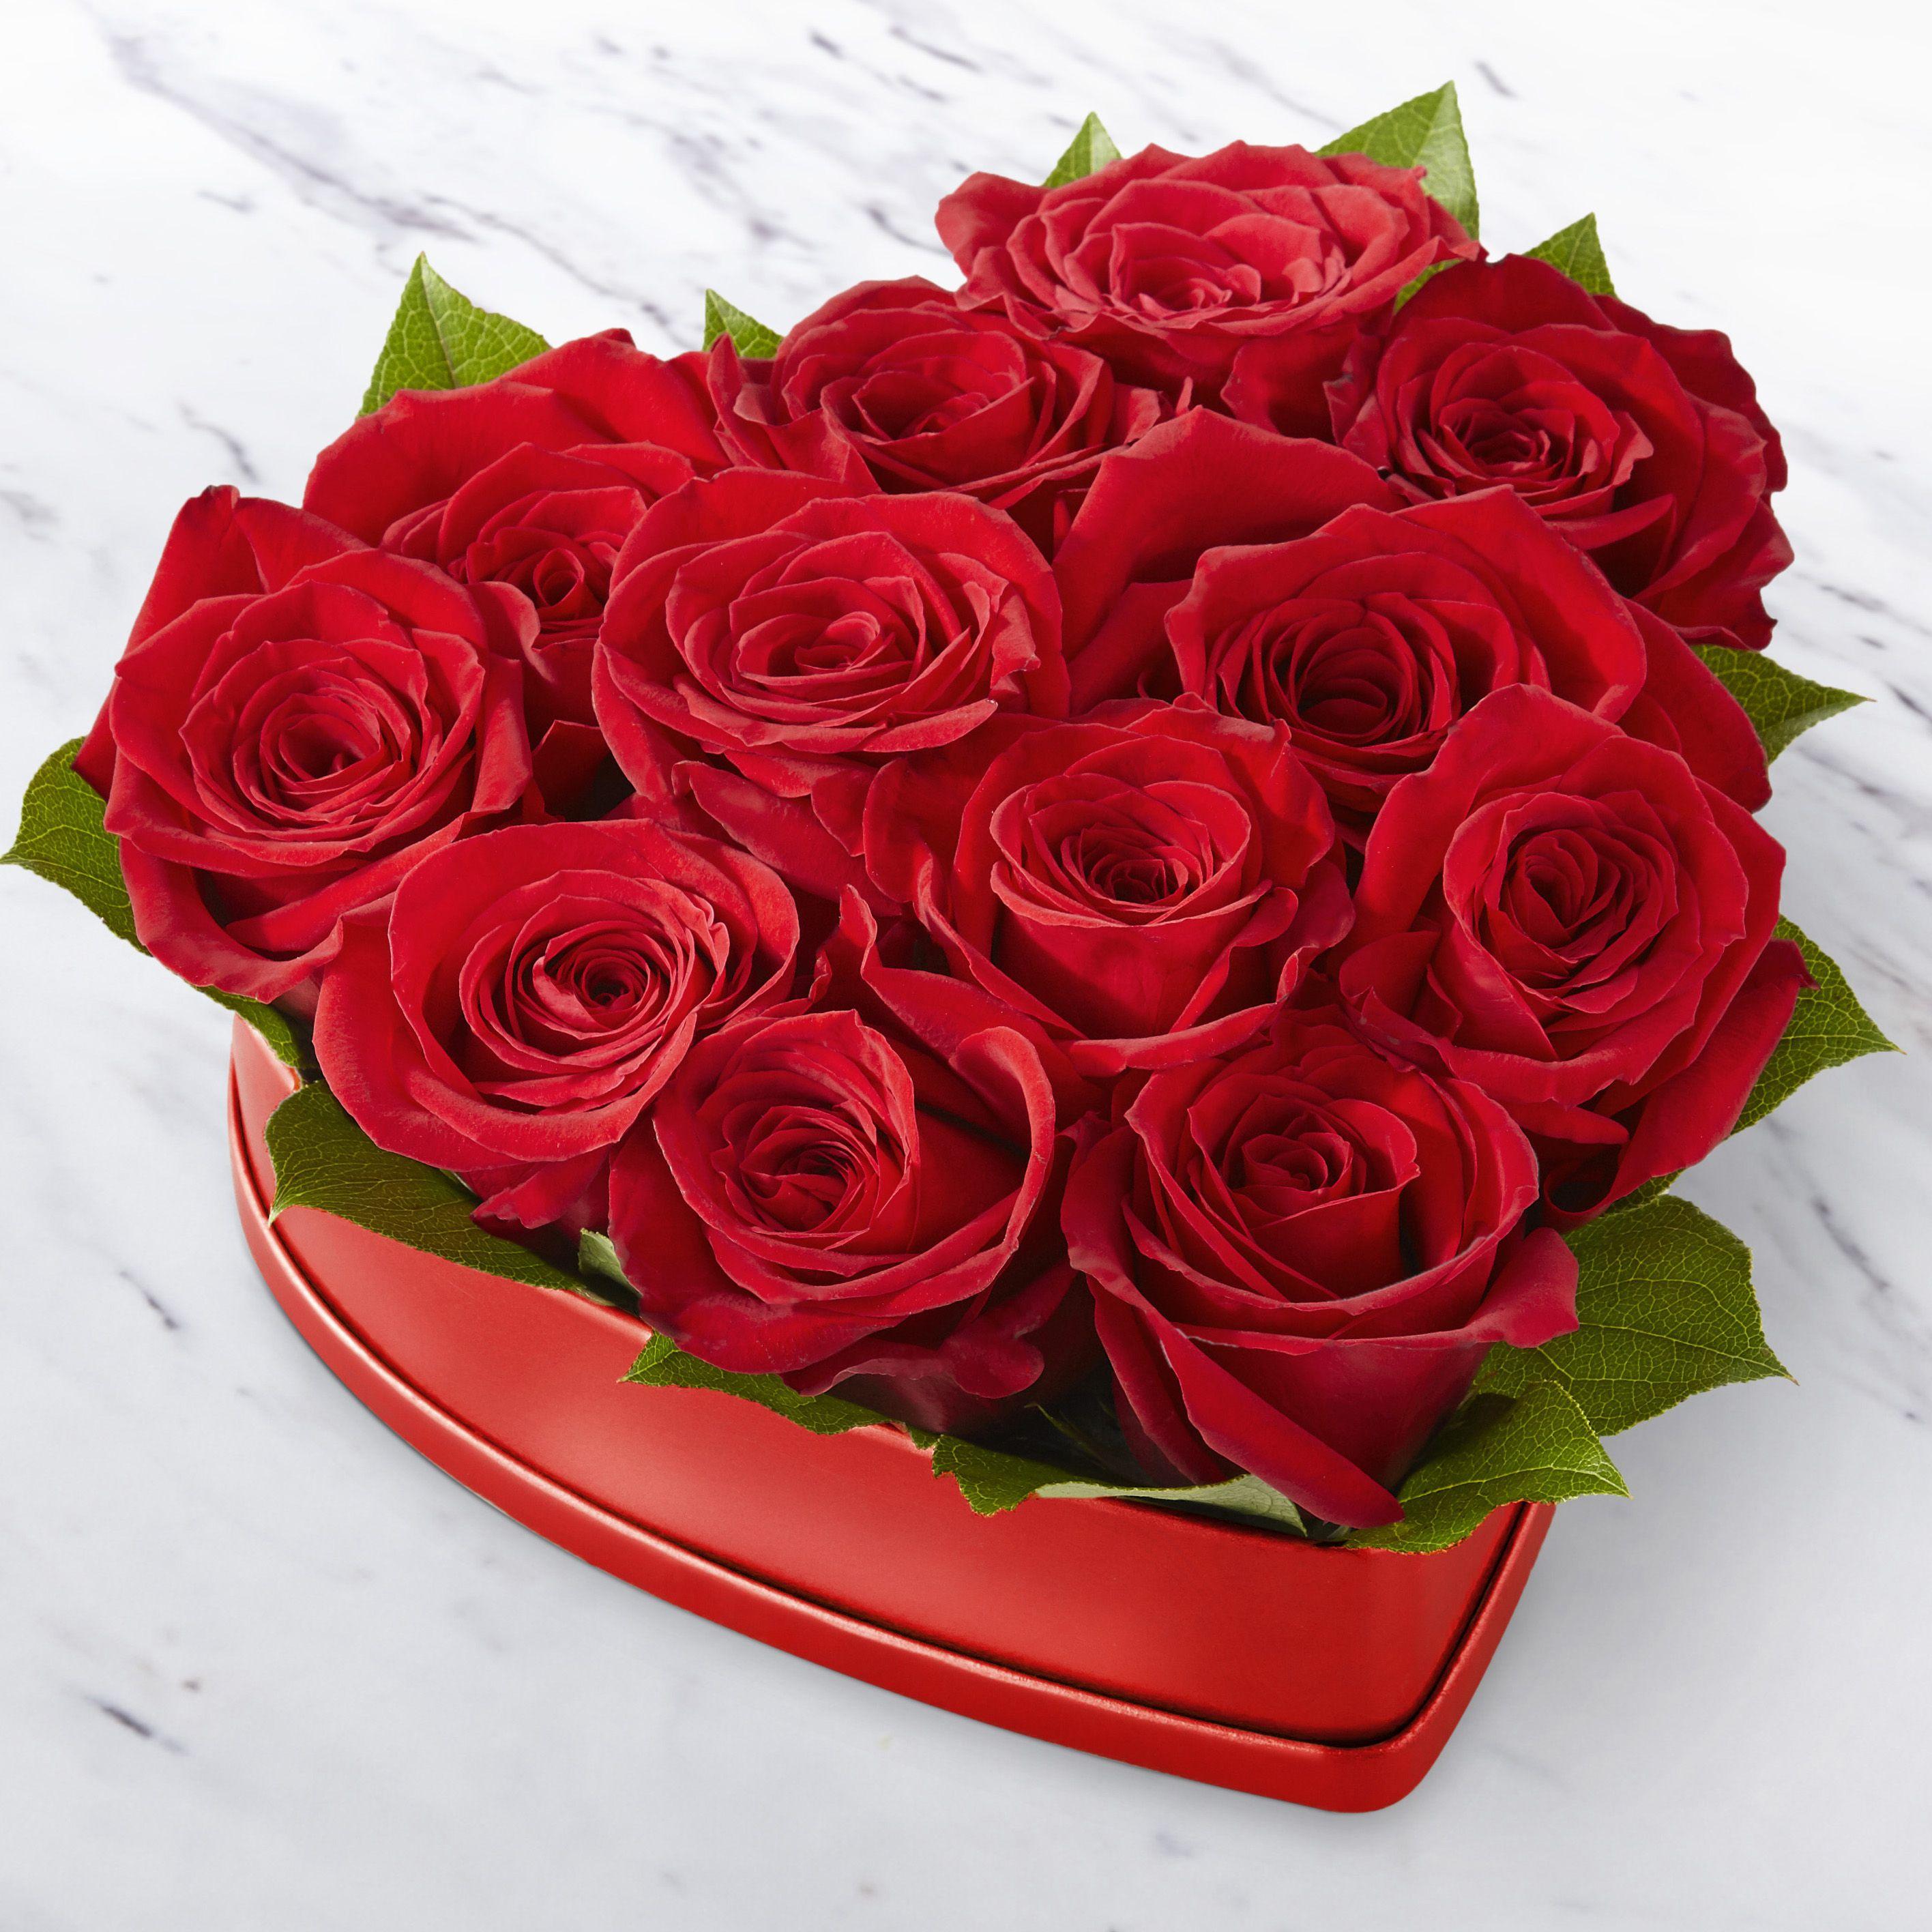 Lovely Red Rose Heart™ Box in Miami Beach, FL Miami